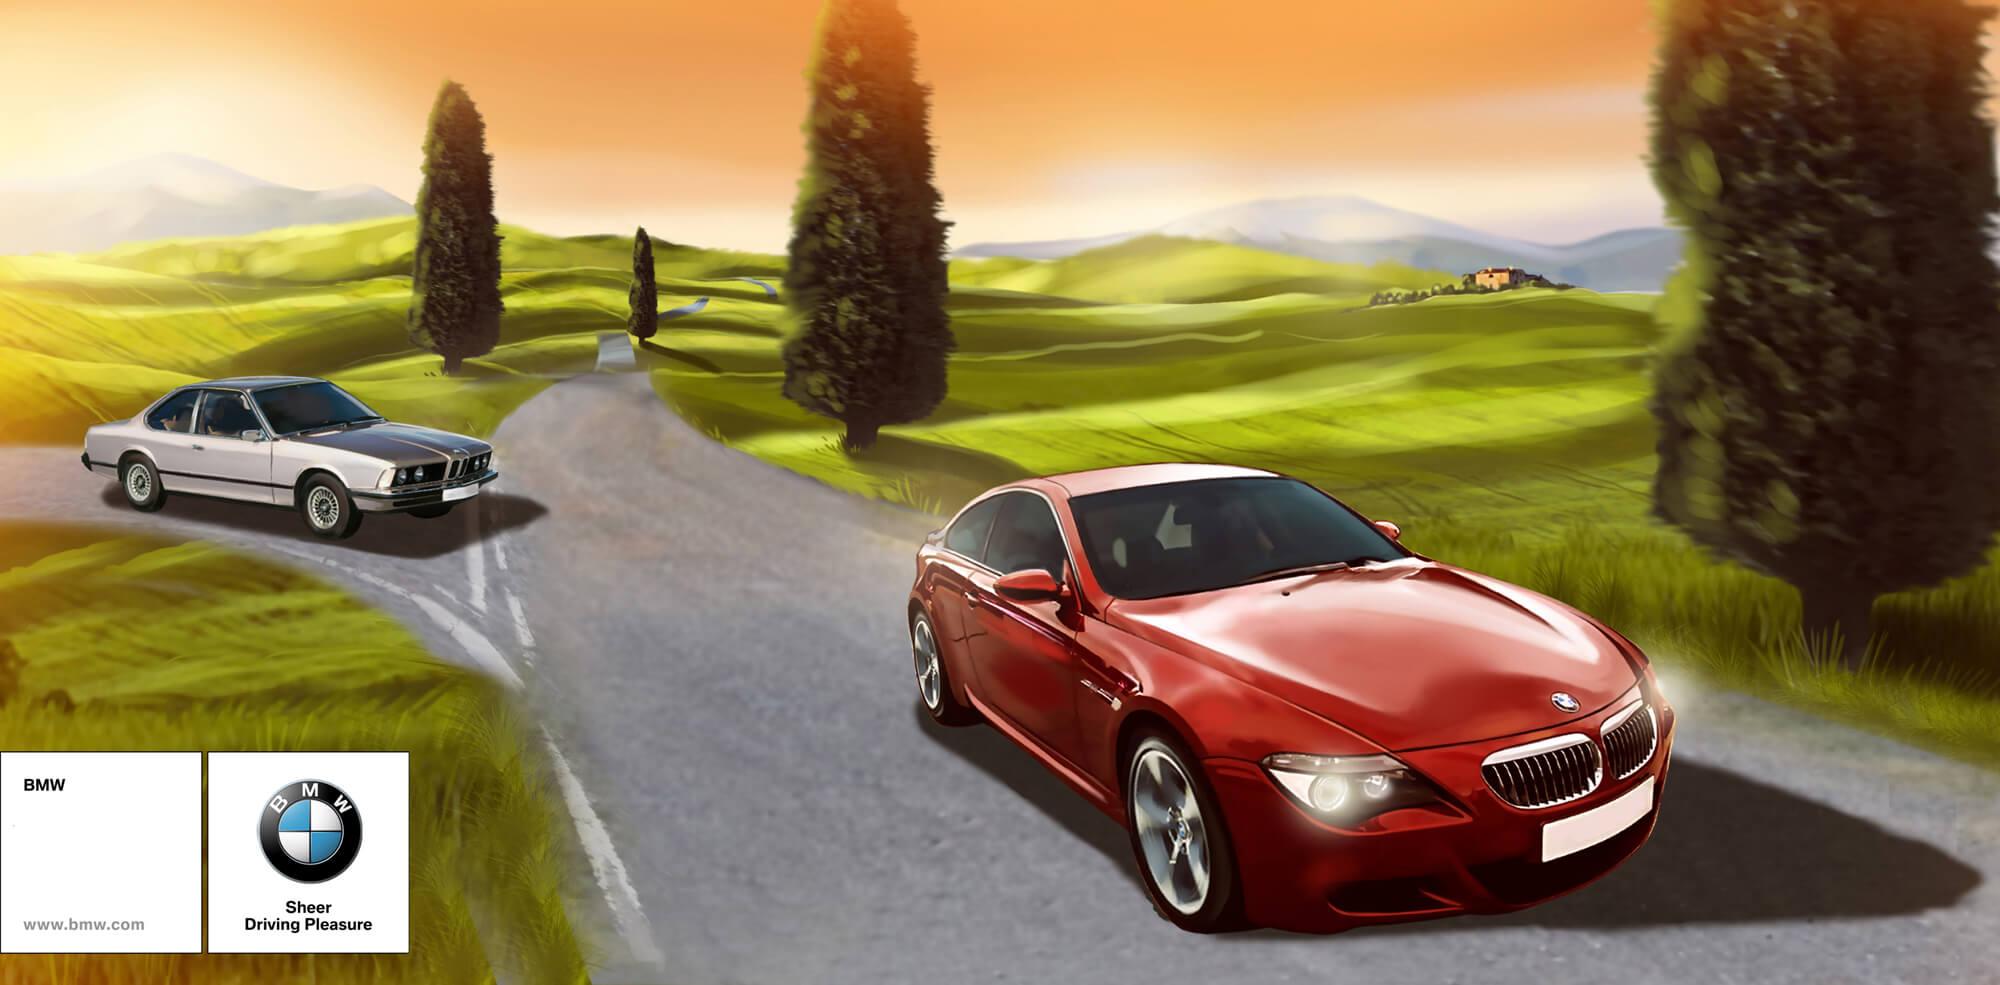 BMW_Print_Ads_5.jpg